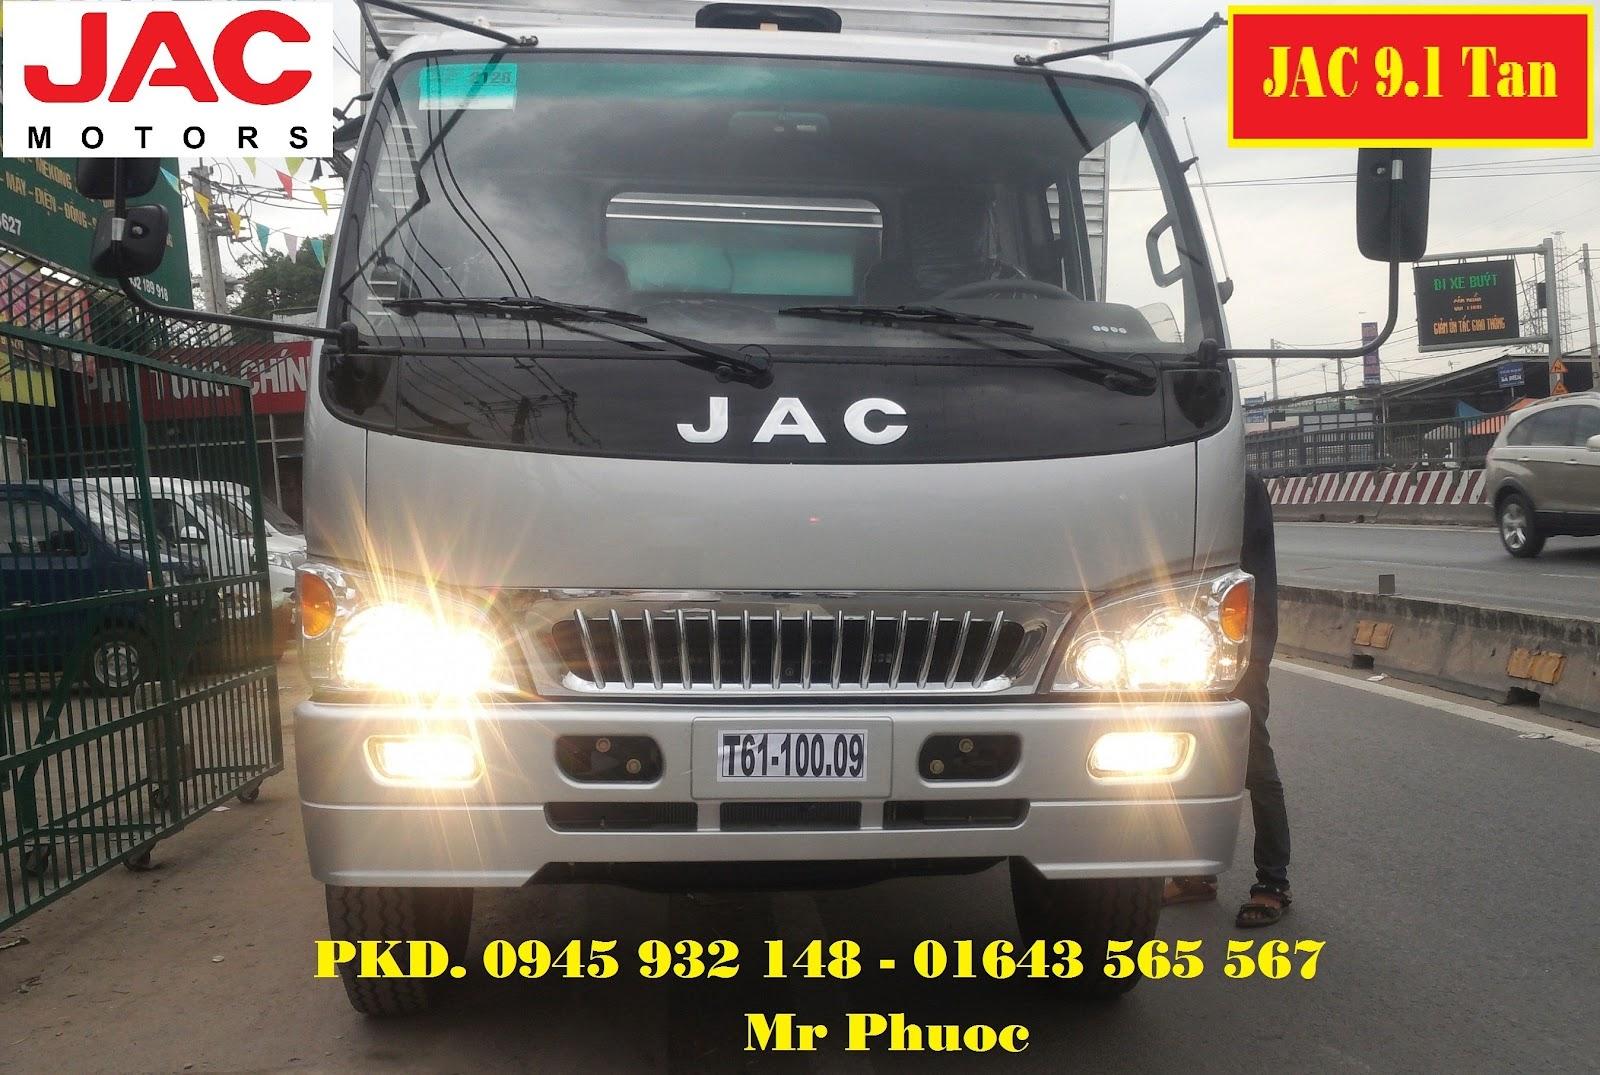 xe JAC 9.1 tấn, xe tải JAC 9T1, bán xe tải JAC 9.1 tấn mui bạt, mua xe tải JAC 9 tấn 1